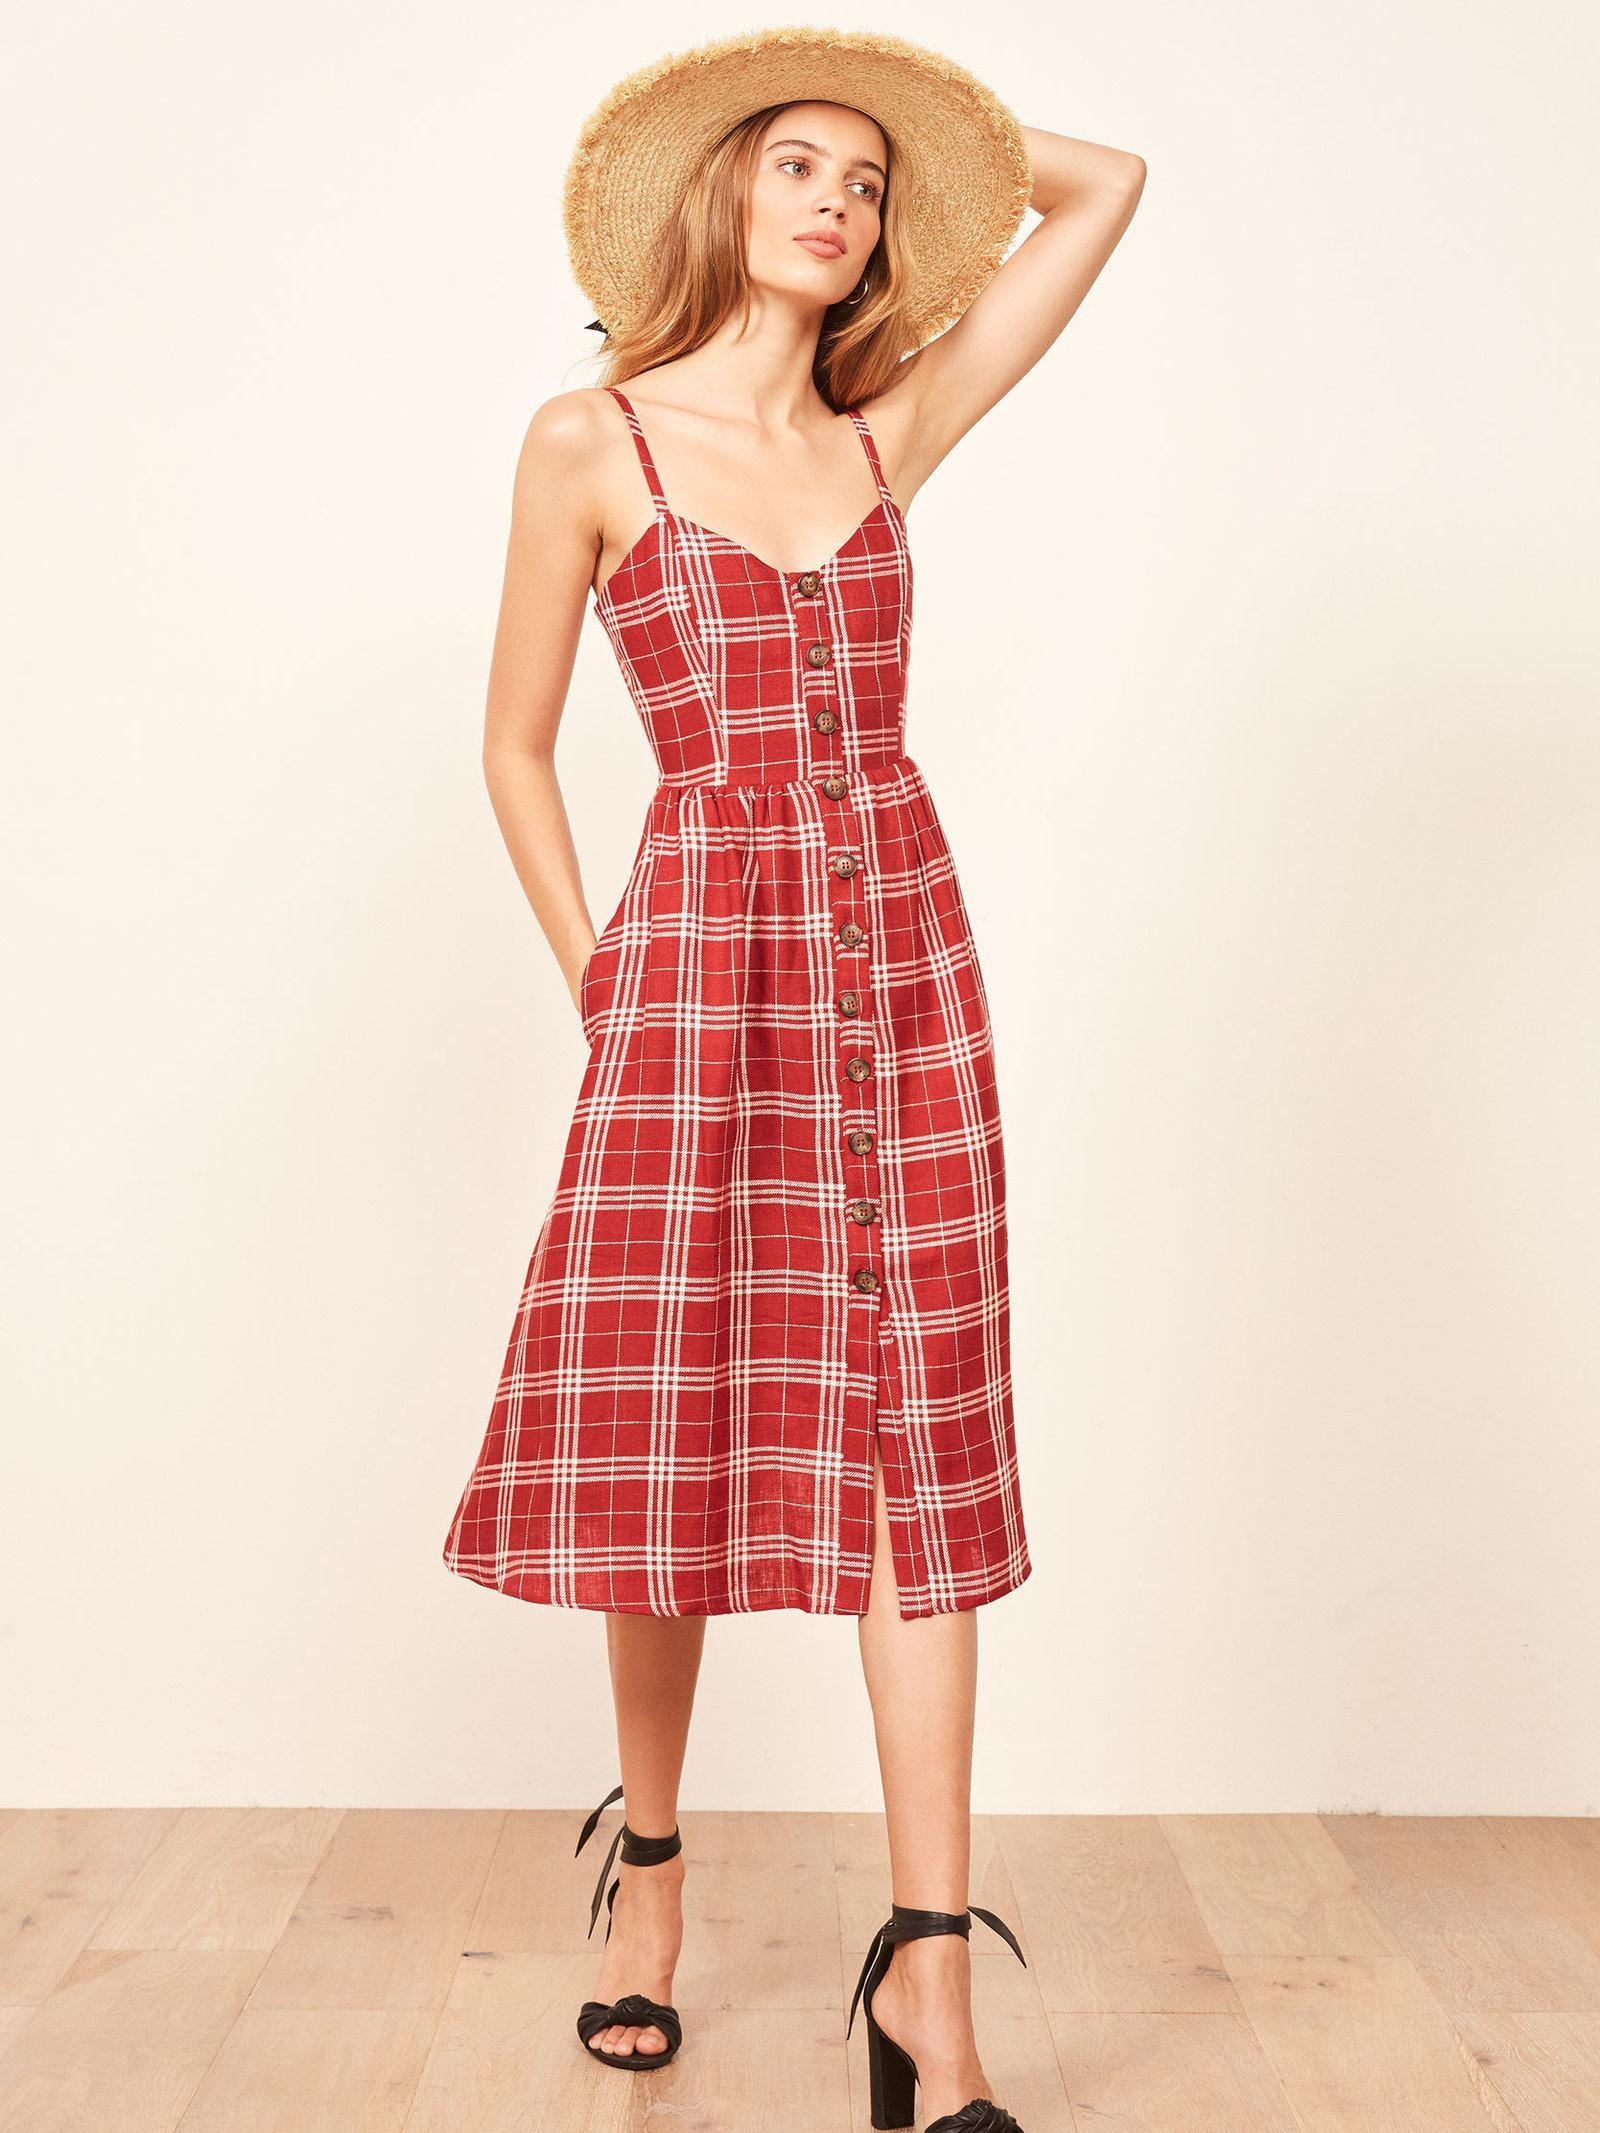 Thelma Dress - $198